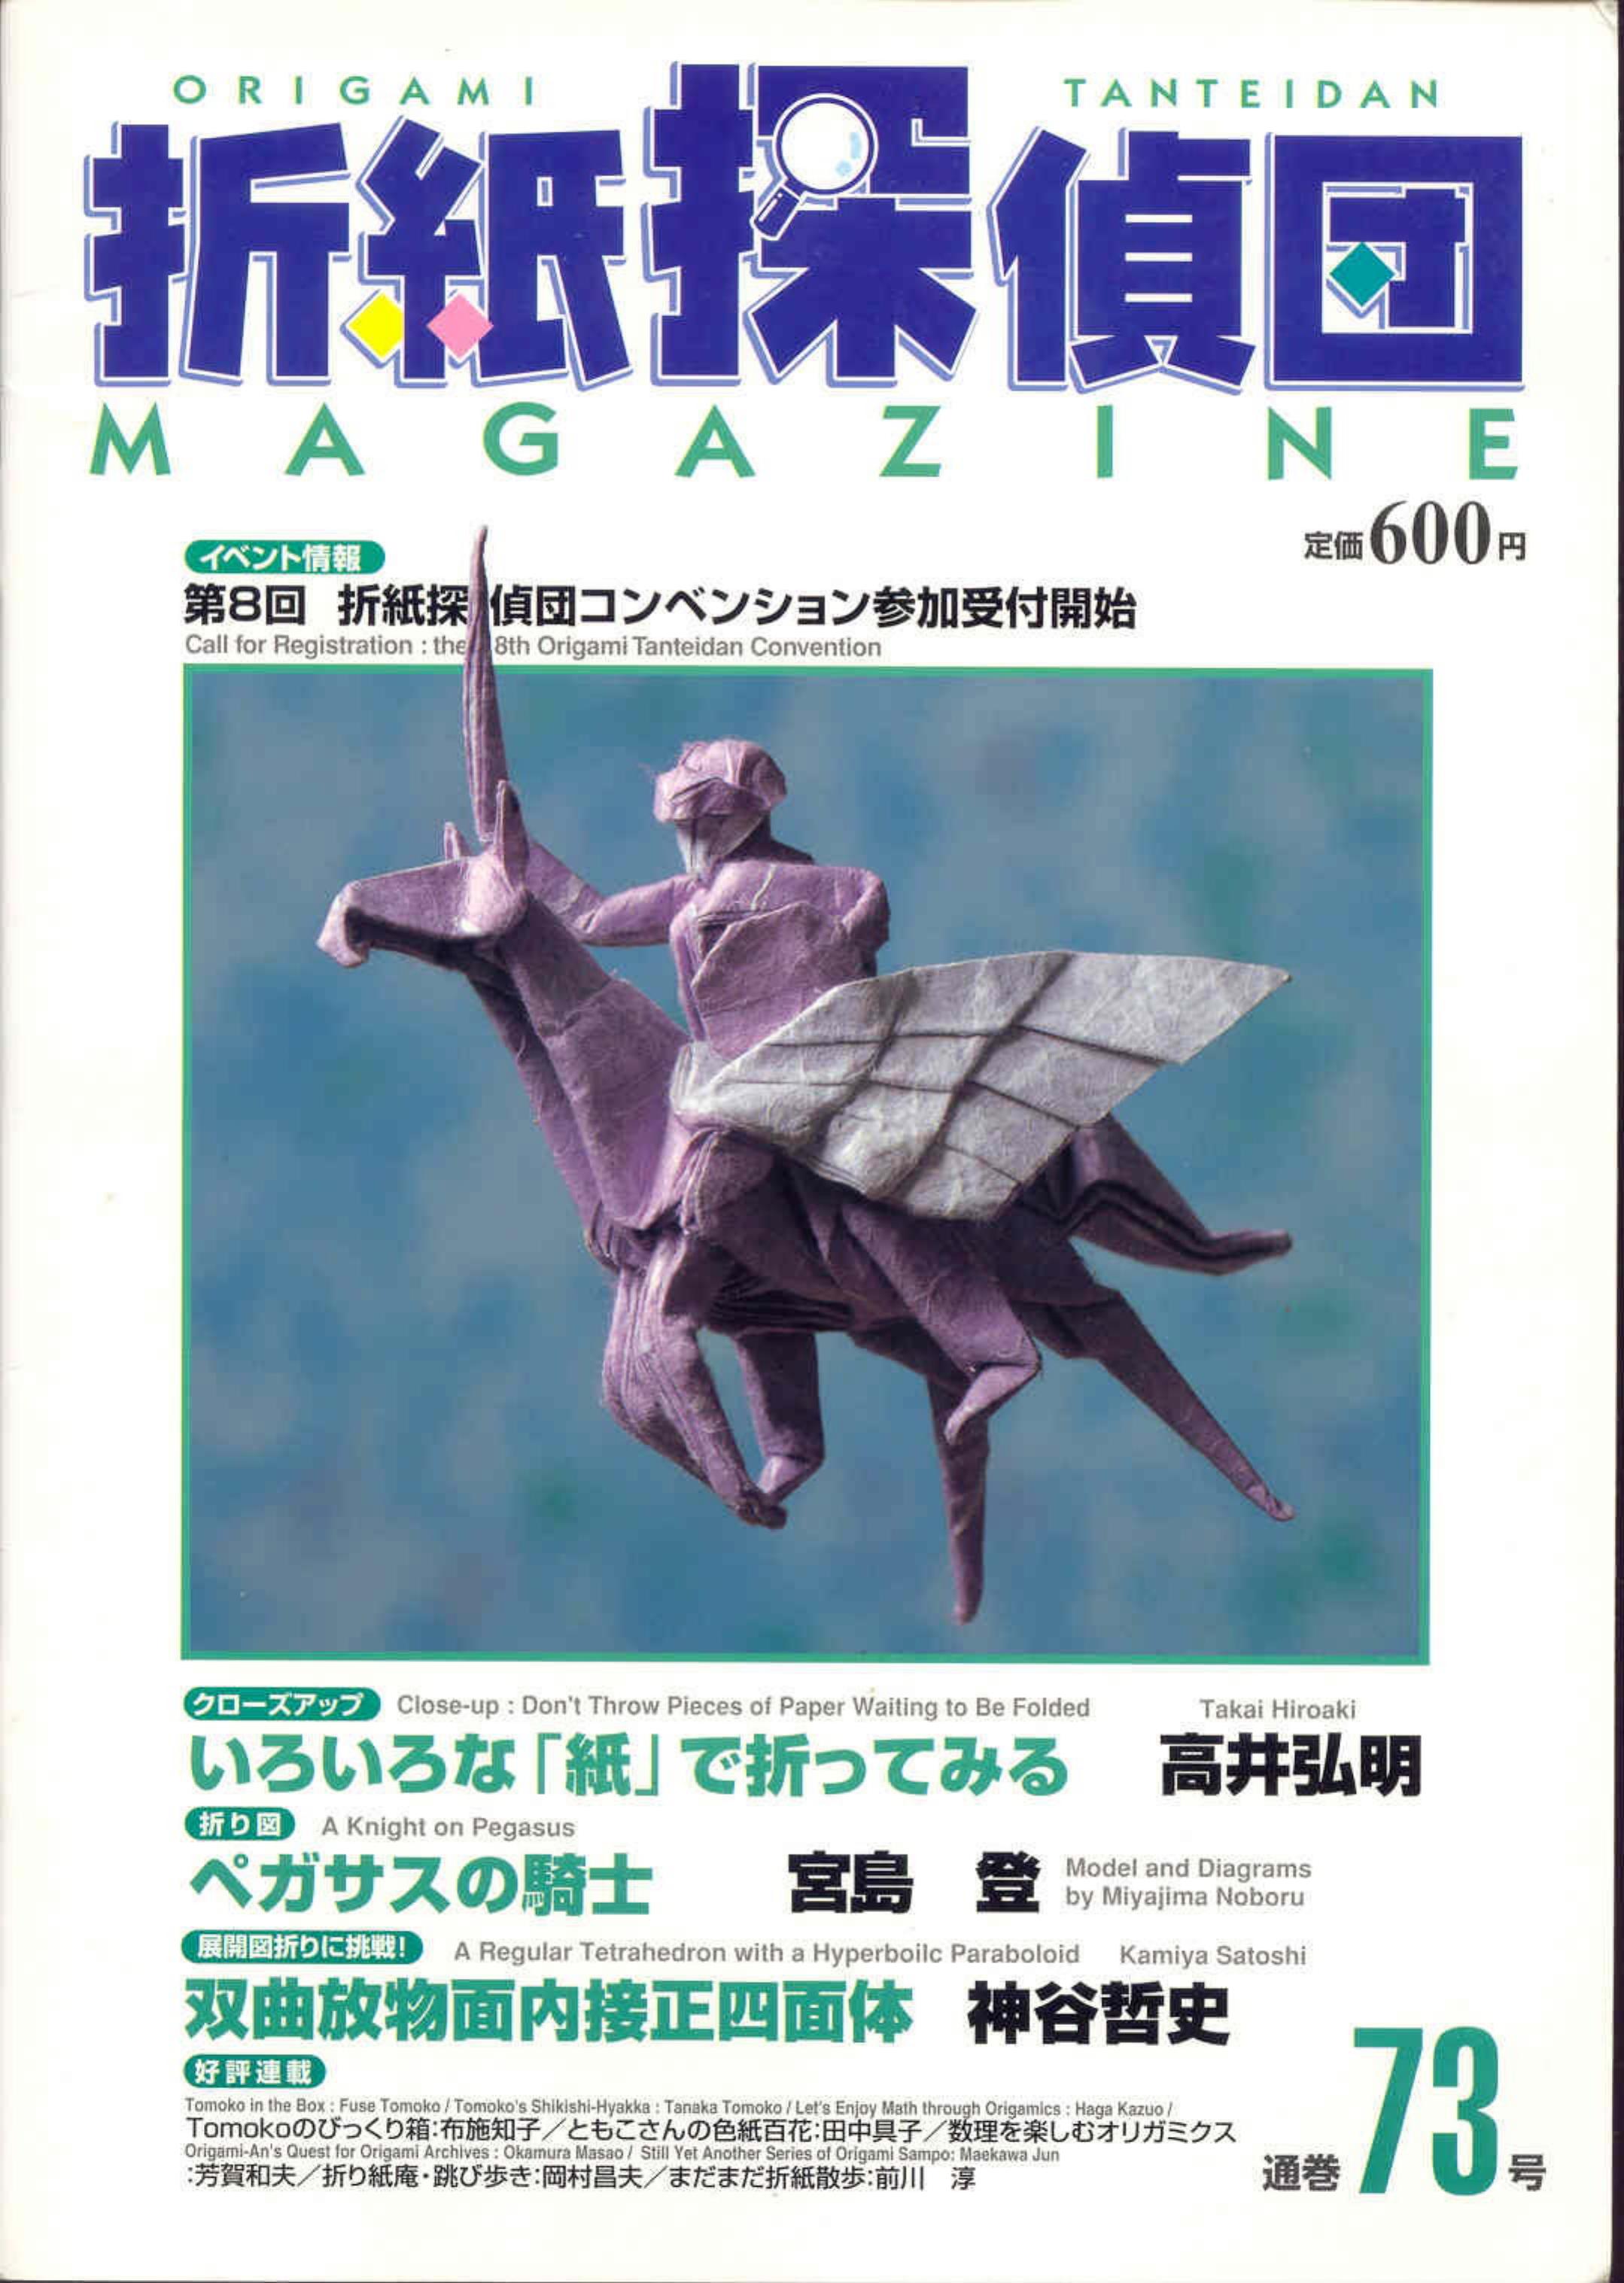 Works of Hideo Komatsu by Hideo Komatsu Book Review | Gilad's ... | 3034x2158